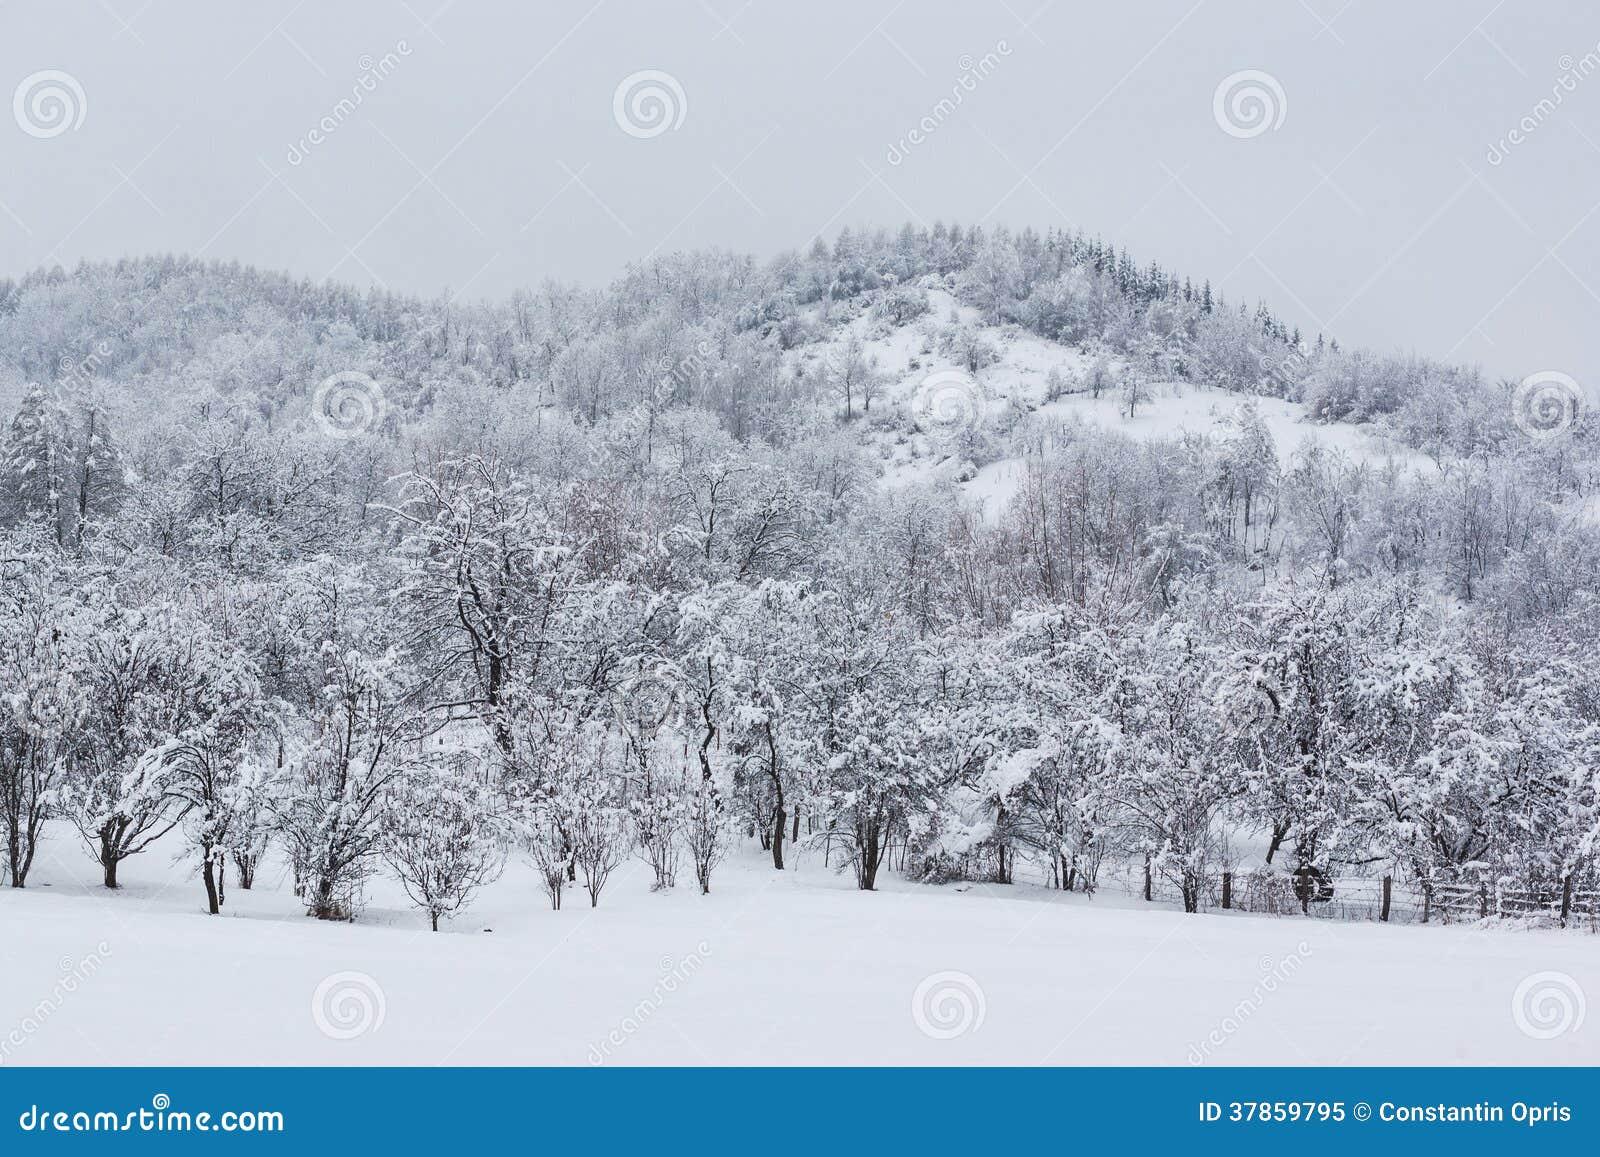 Themes For Christmas Trees